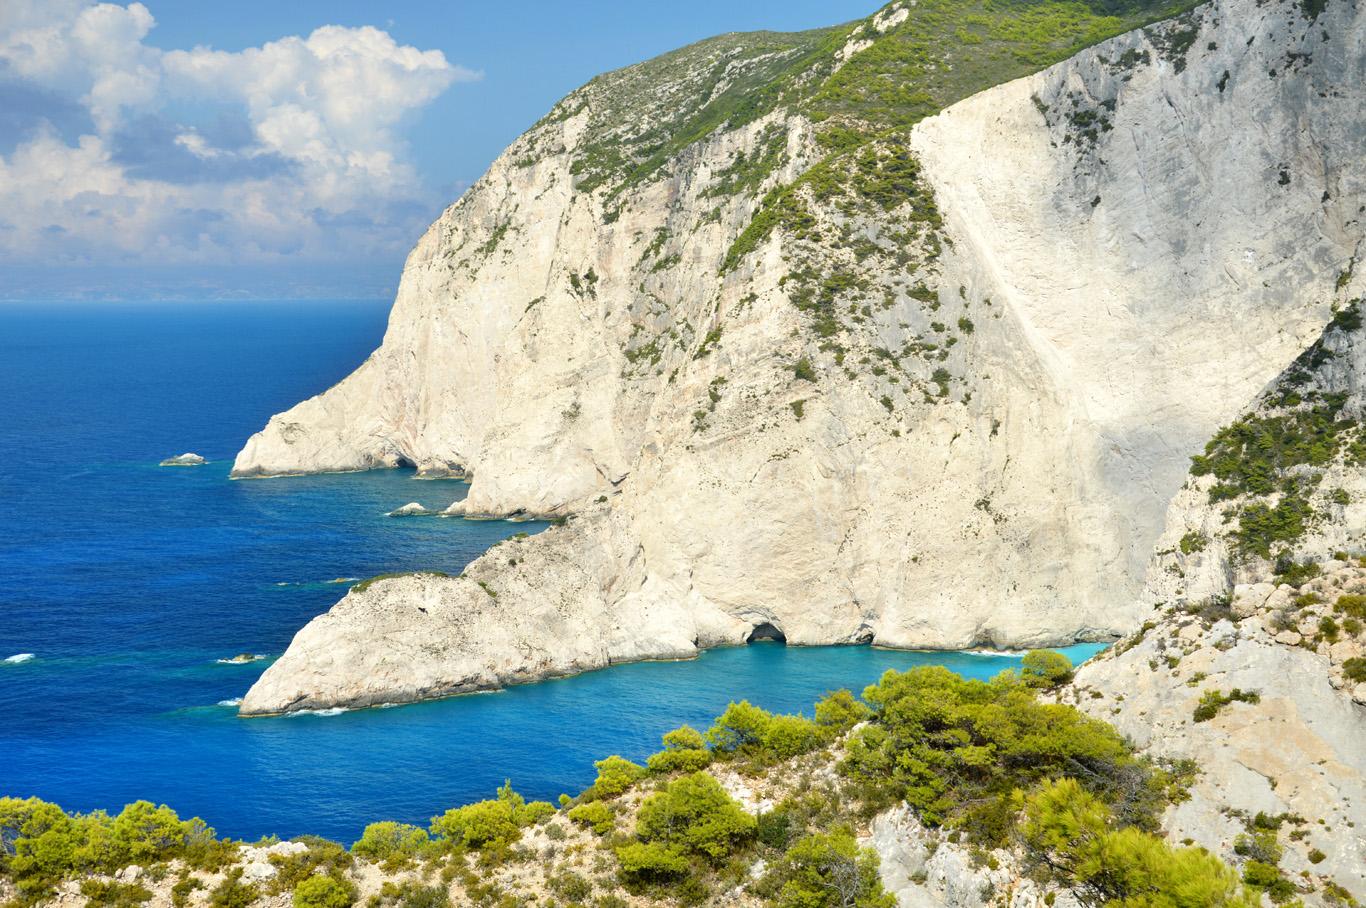 The coast and white cliffs around